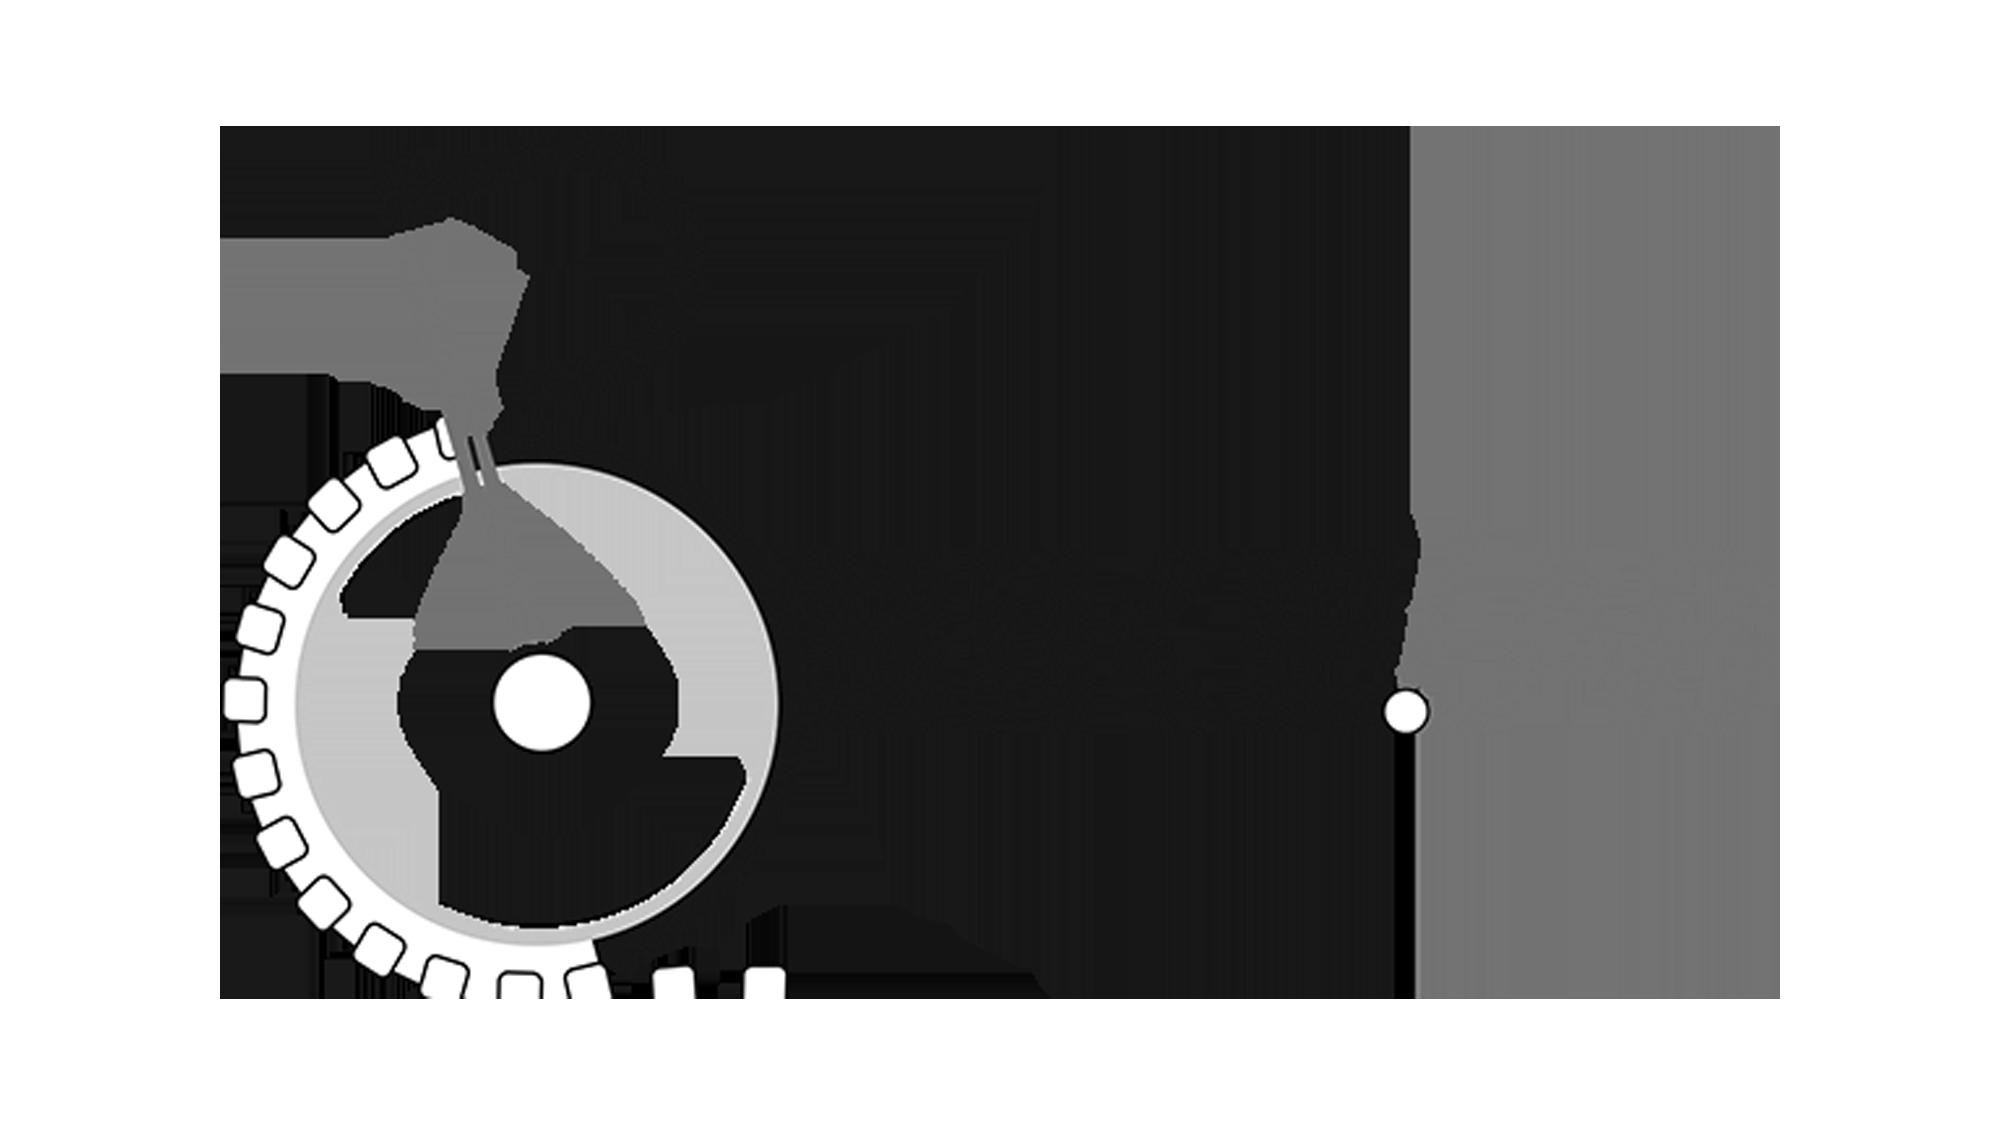 logo_2 ivan rizzitano